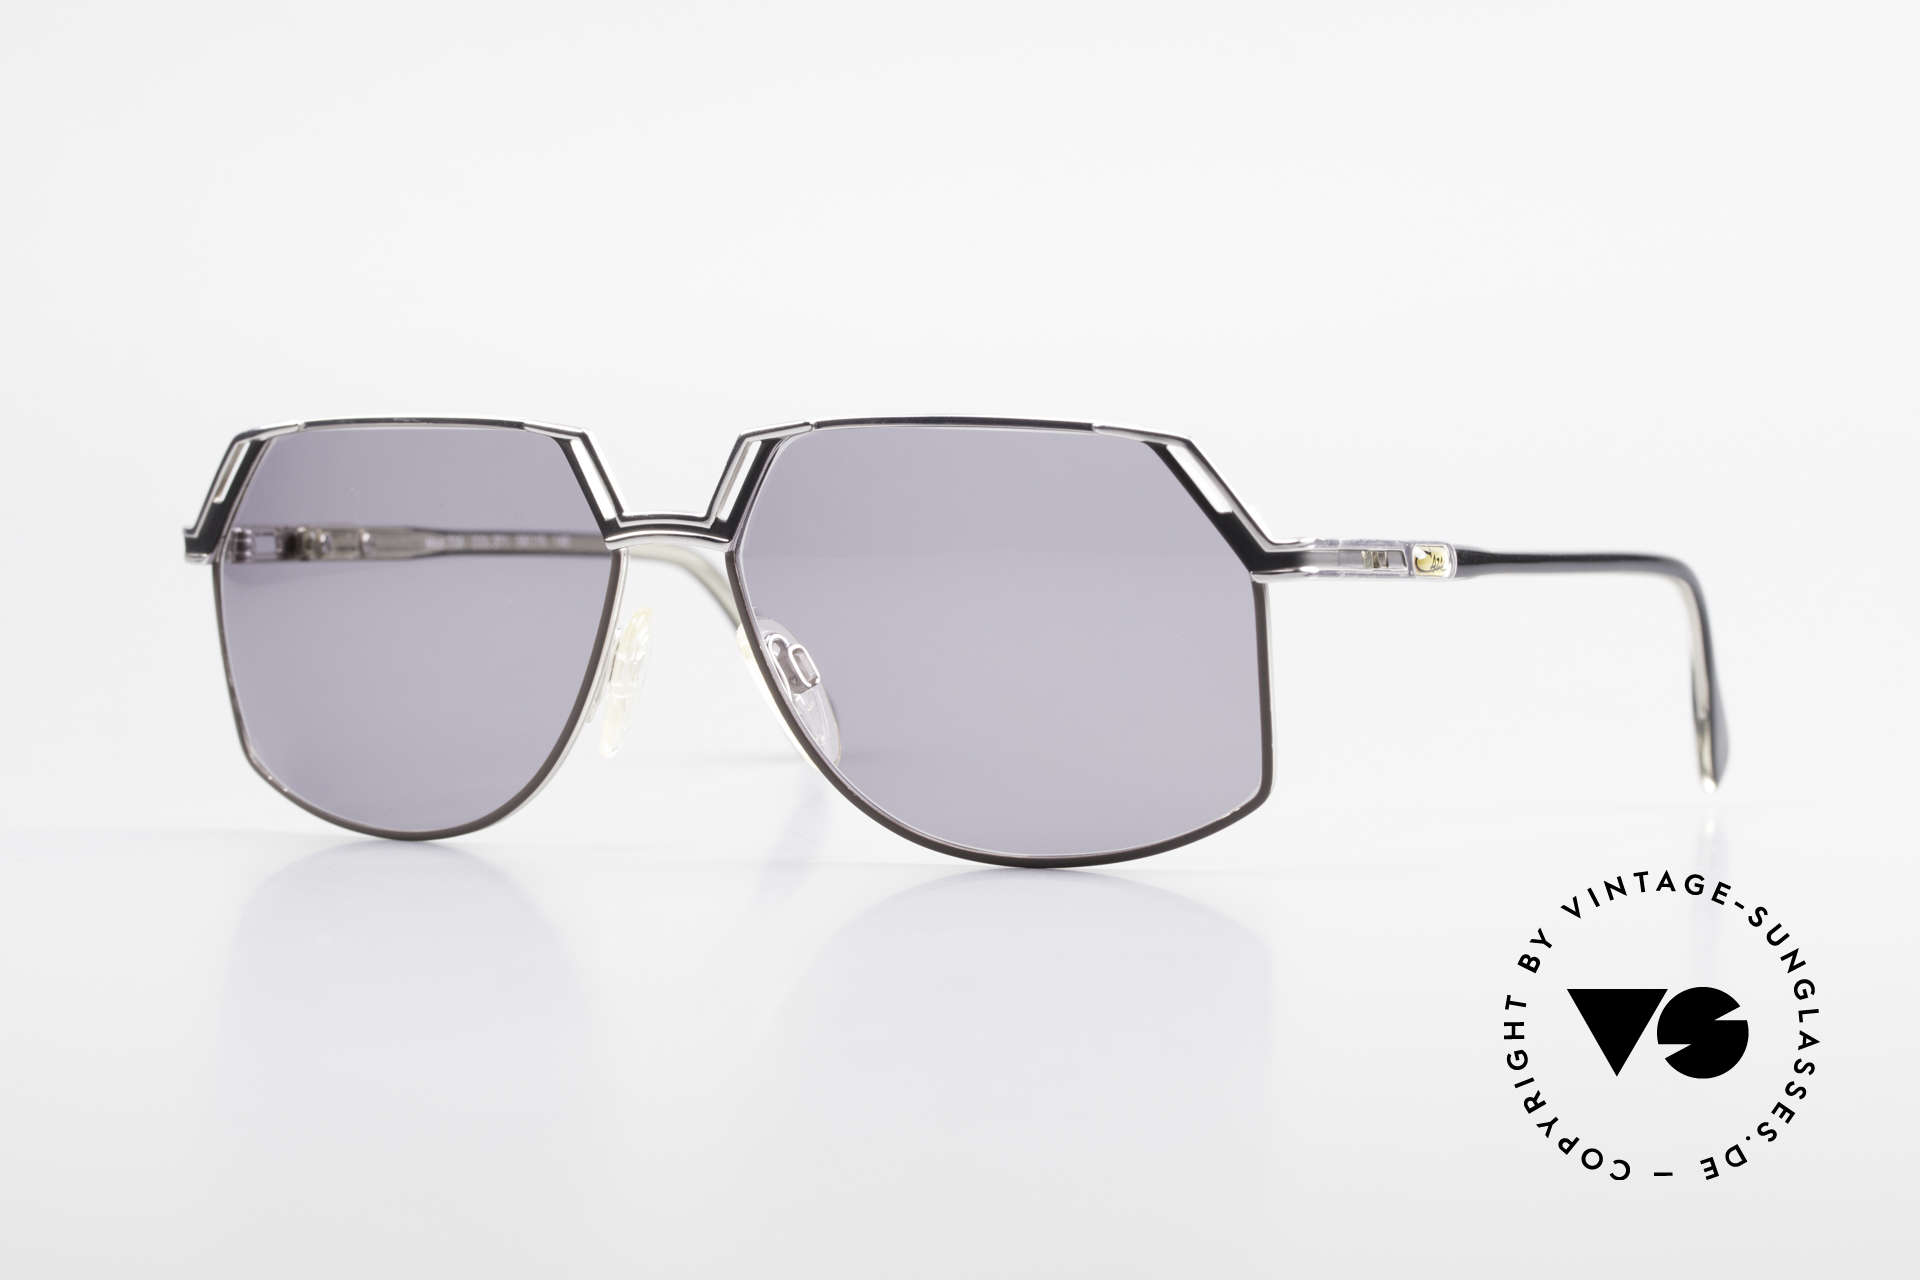 Cazal 738 True Vintage Sunglasses, distinctive CAZAL men's sunglasses of the 1980's/1990s, Made for Men